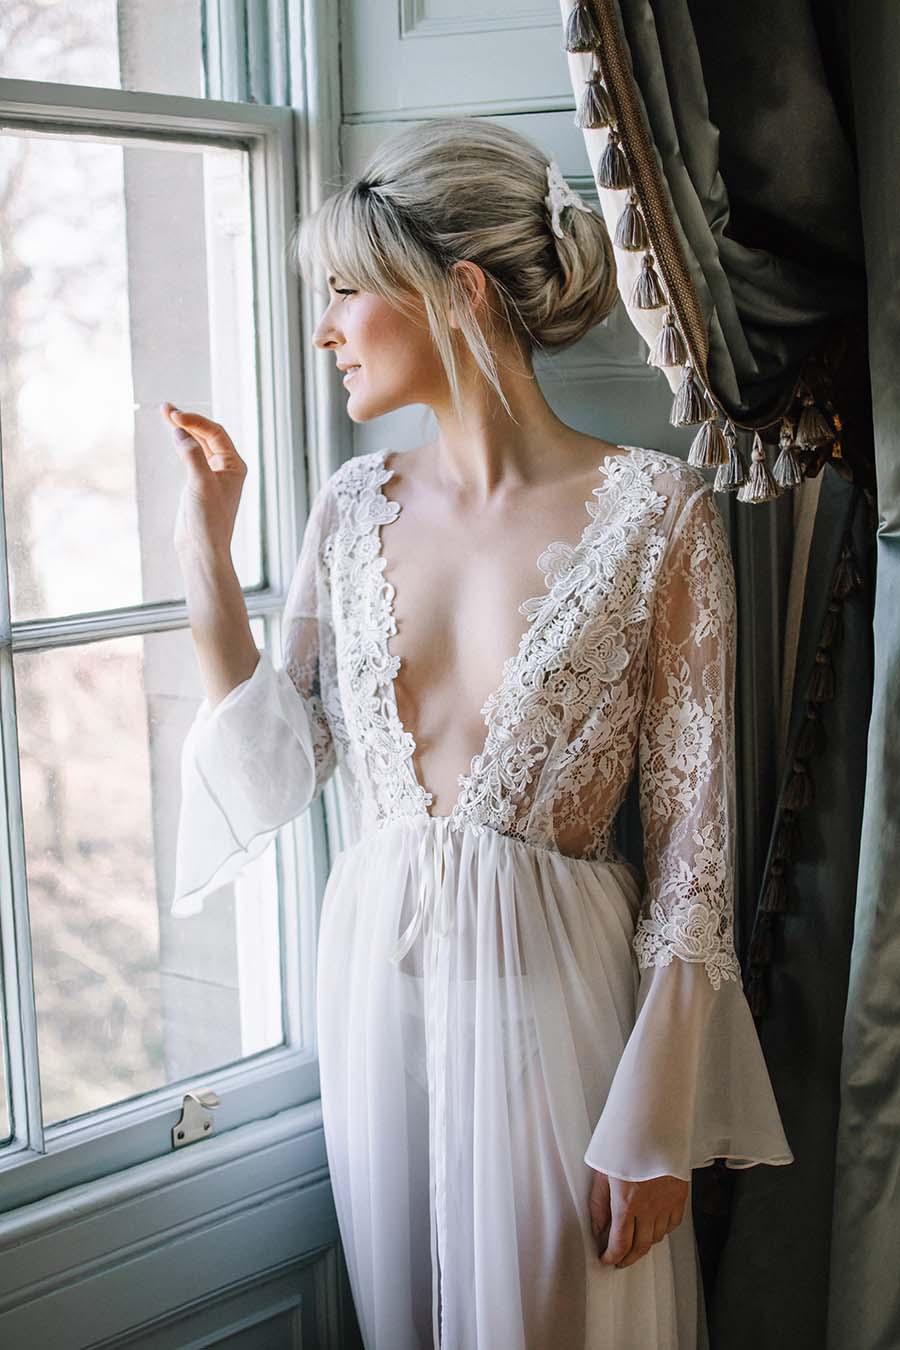 Beautiful Bridal Robes By KMR Bespoke Bridal Designer